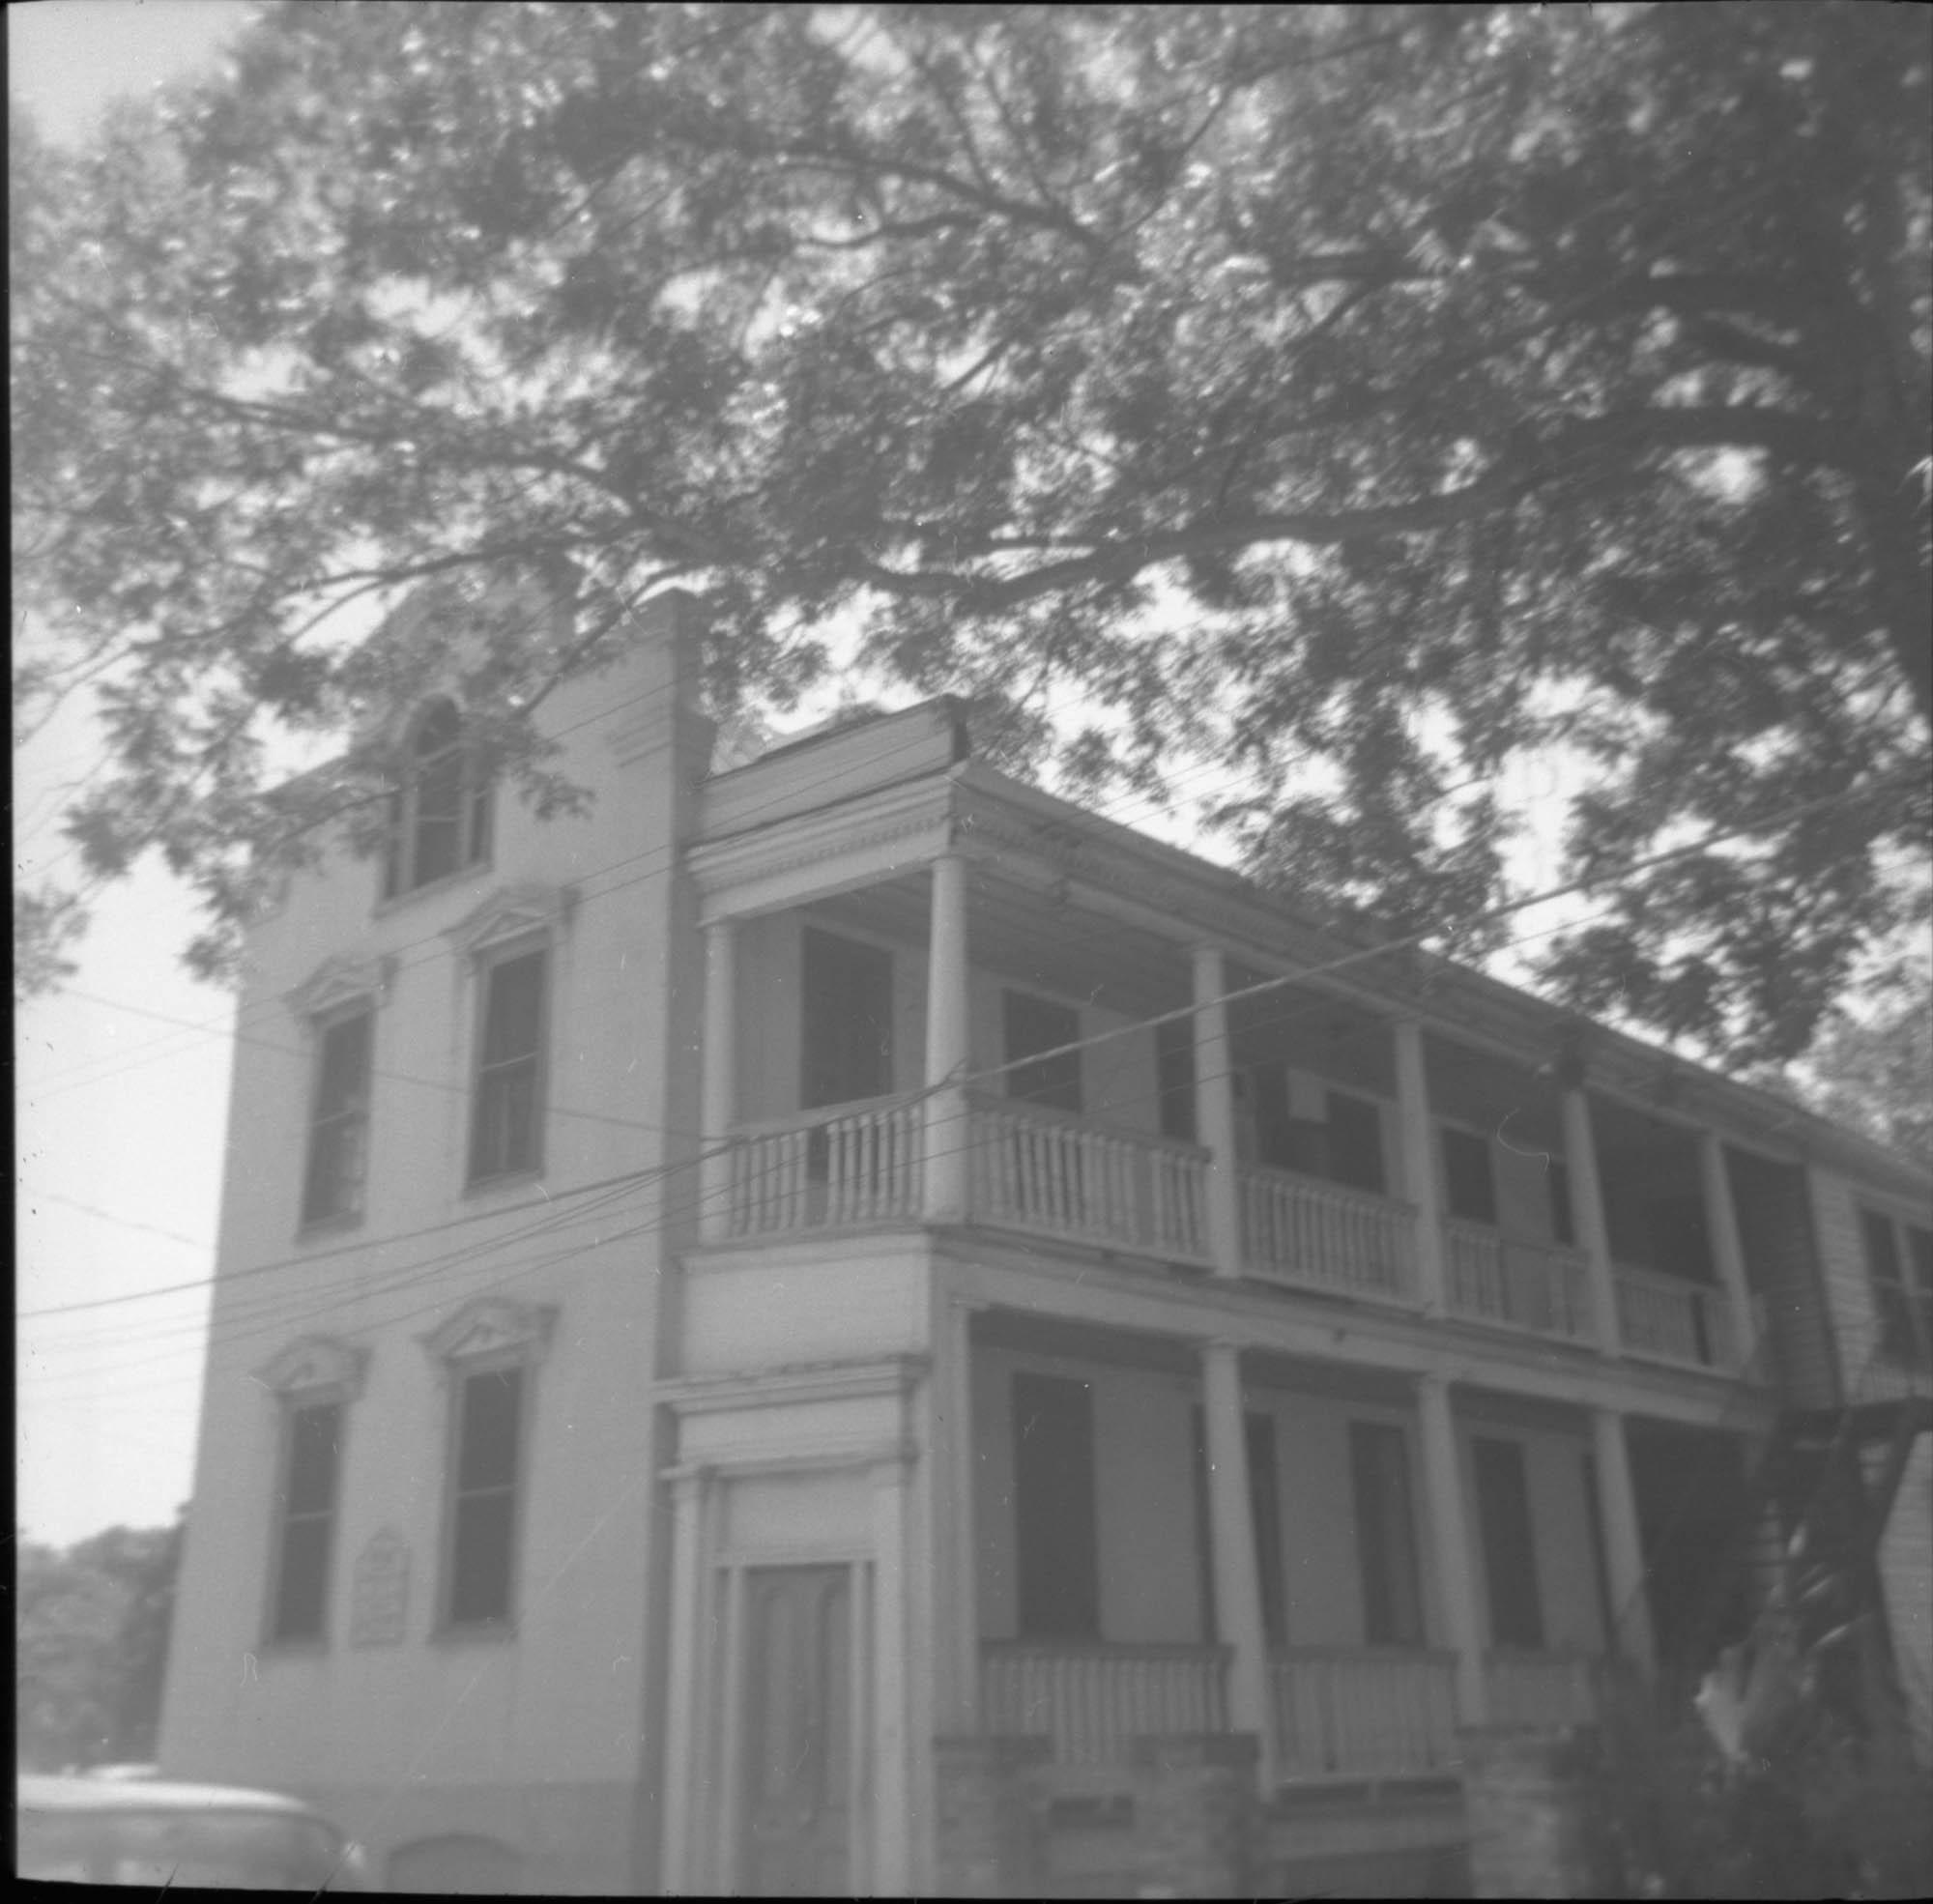 5 George Street [9 George Street]